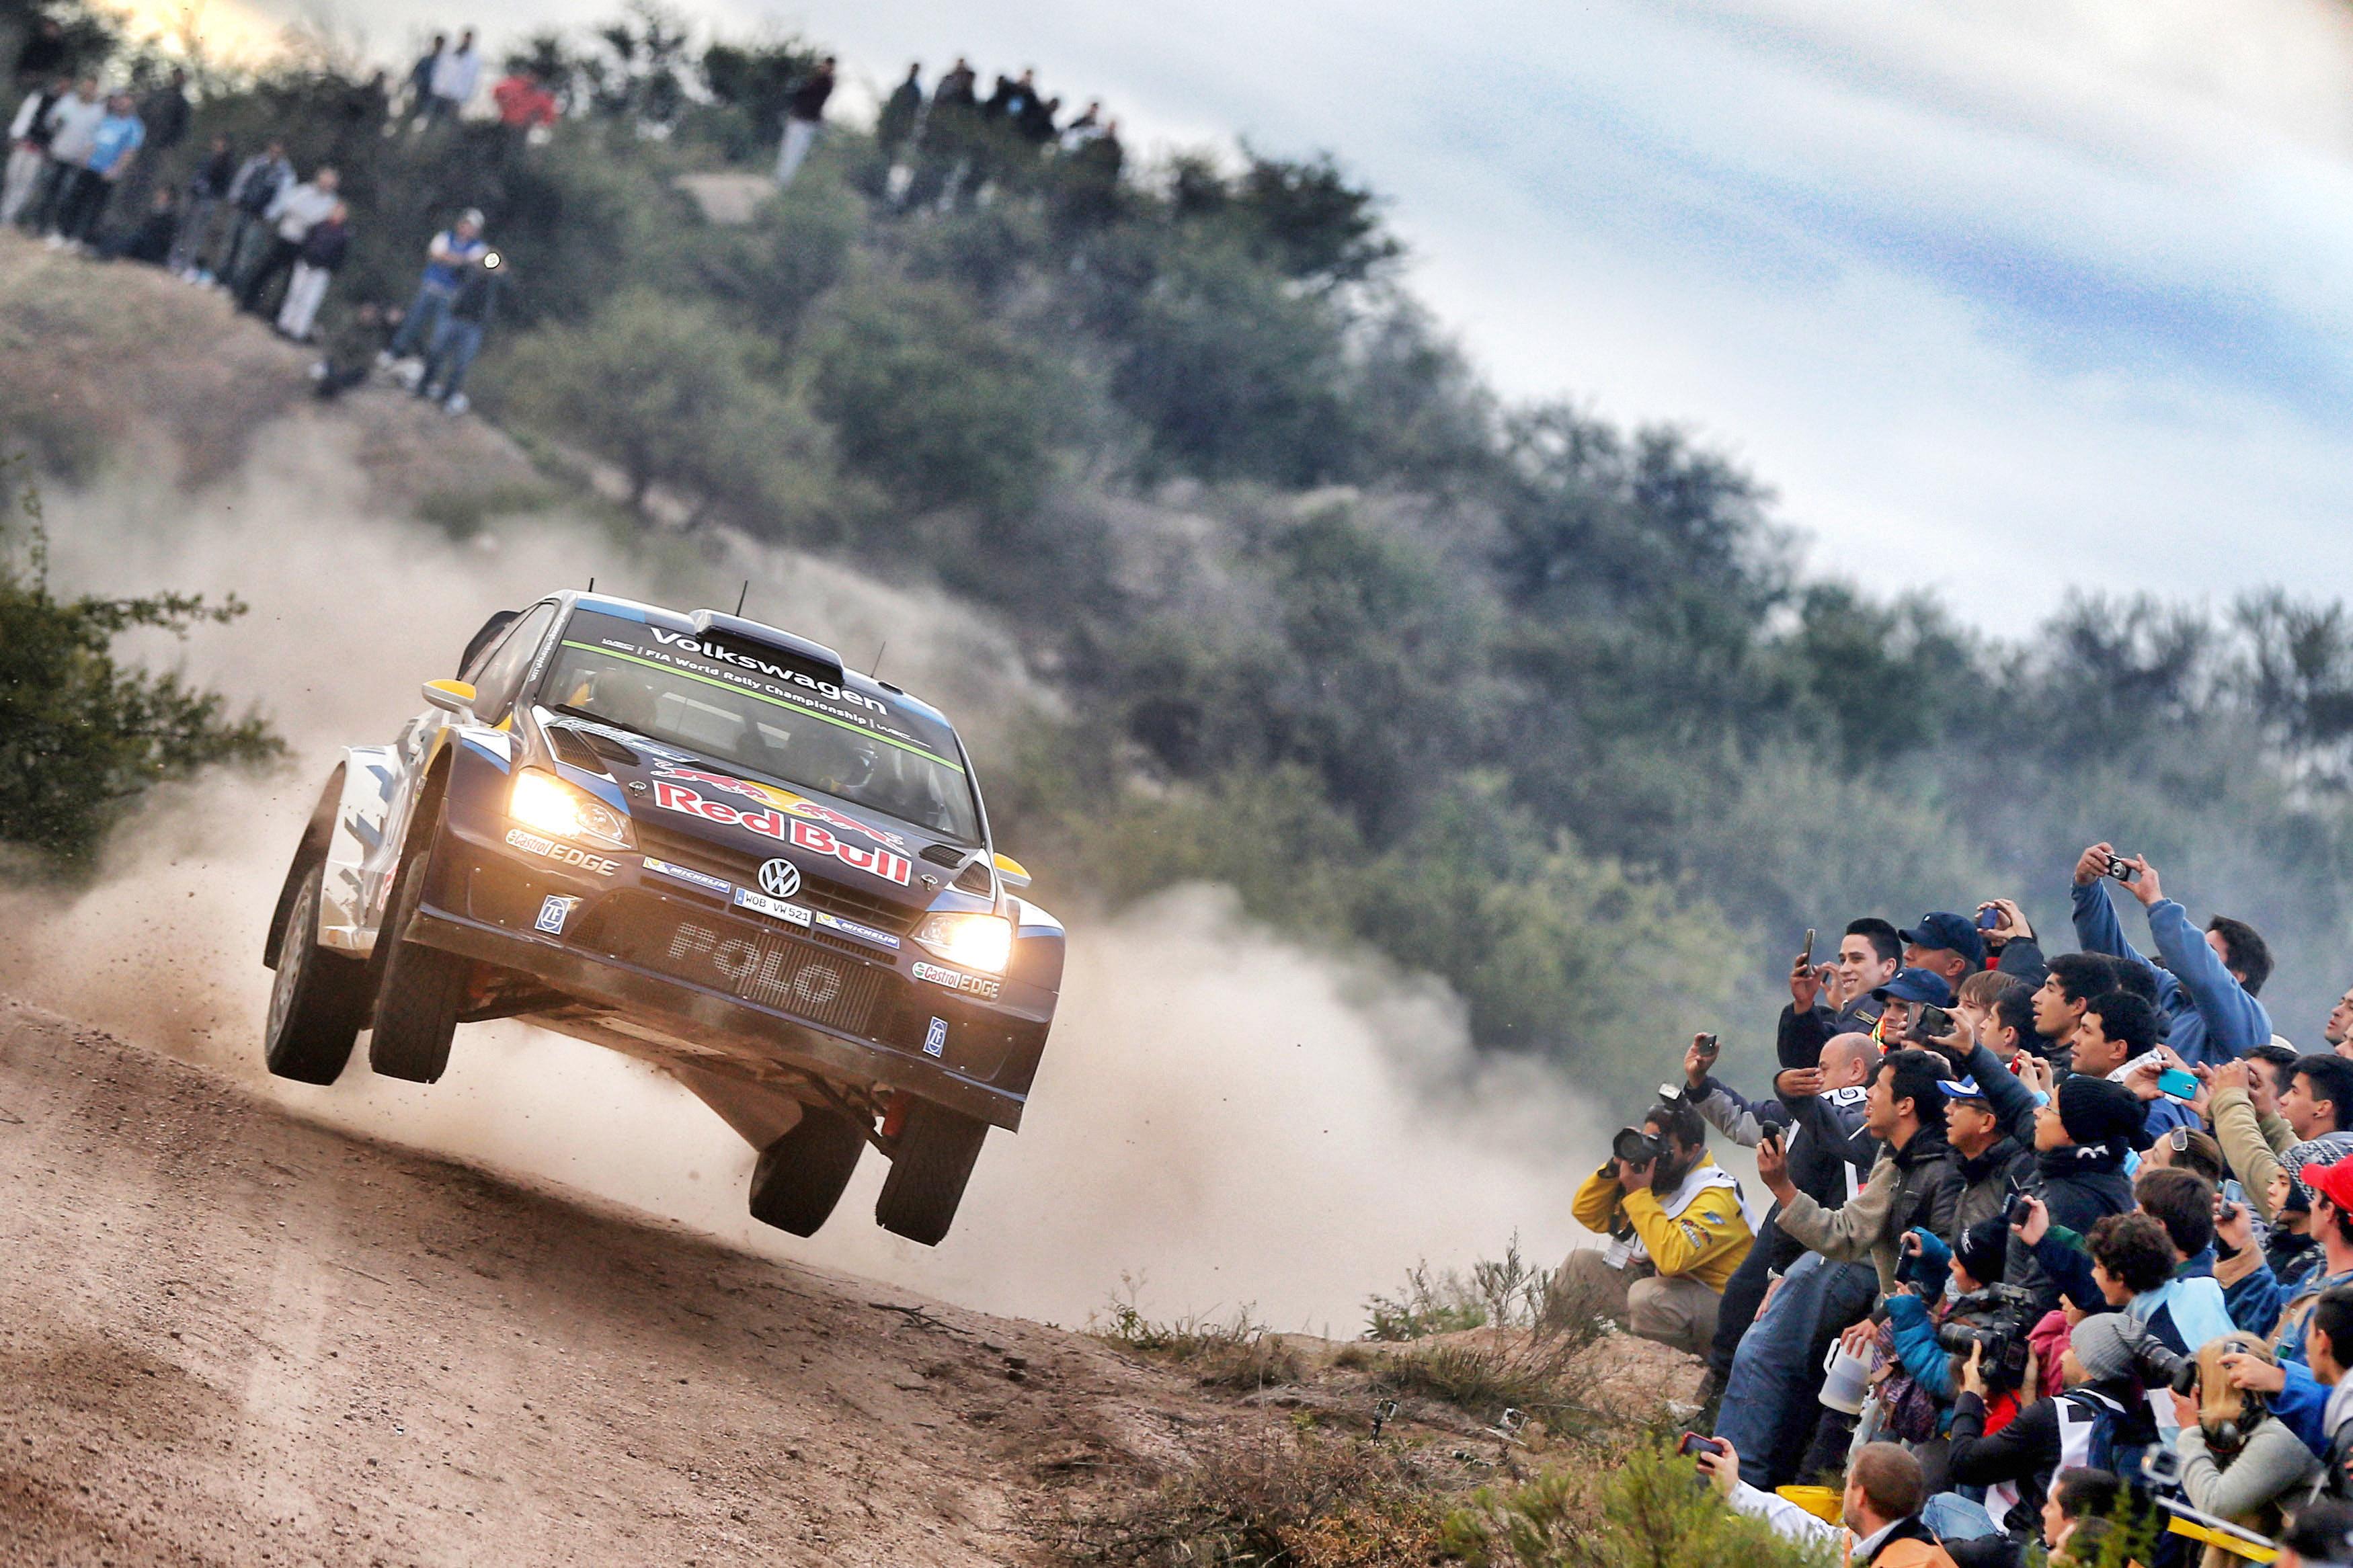 FIA WORLD RALLY CHAMPIONSHIP 2015 -WRC Rally Argentina (ARG) - WRC 17/04/2015 to 19/04/2015 - PHOTO : @World